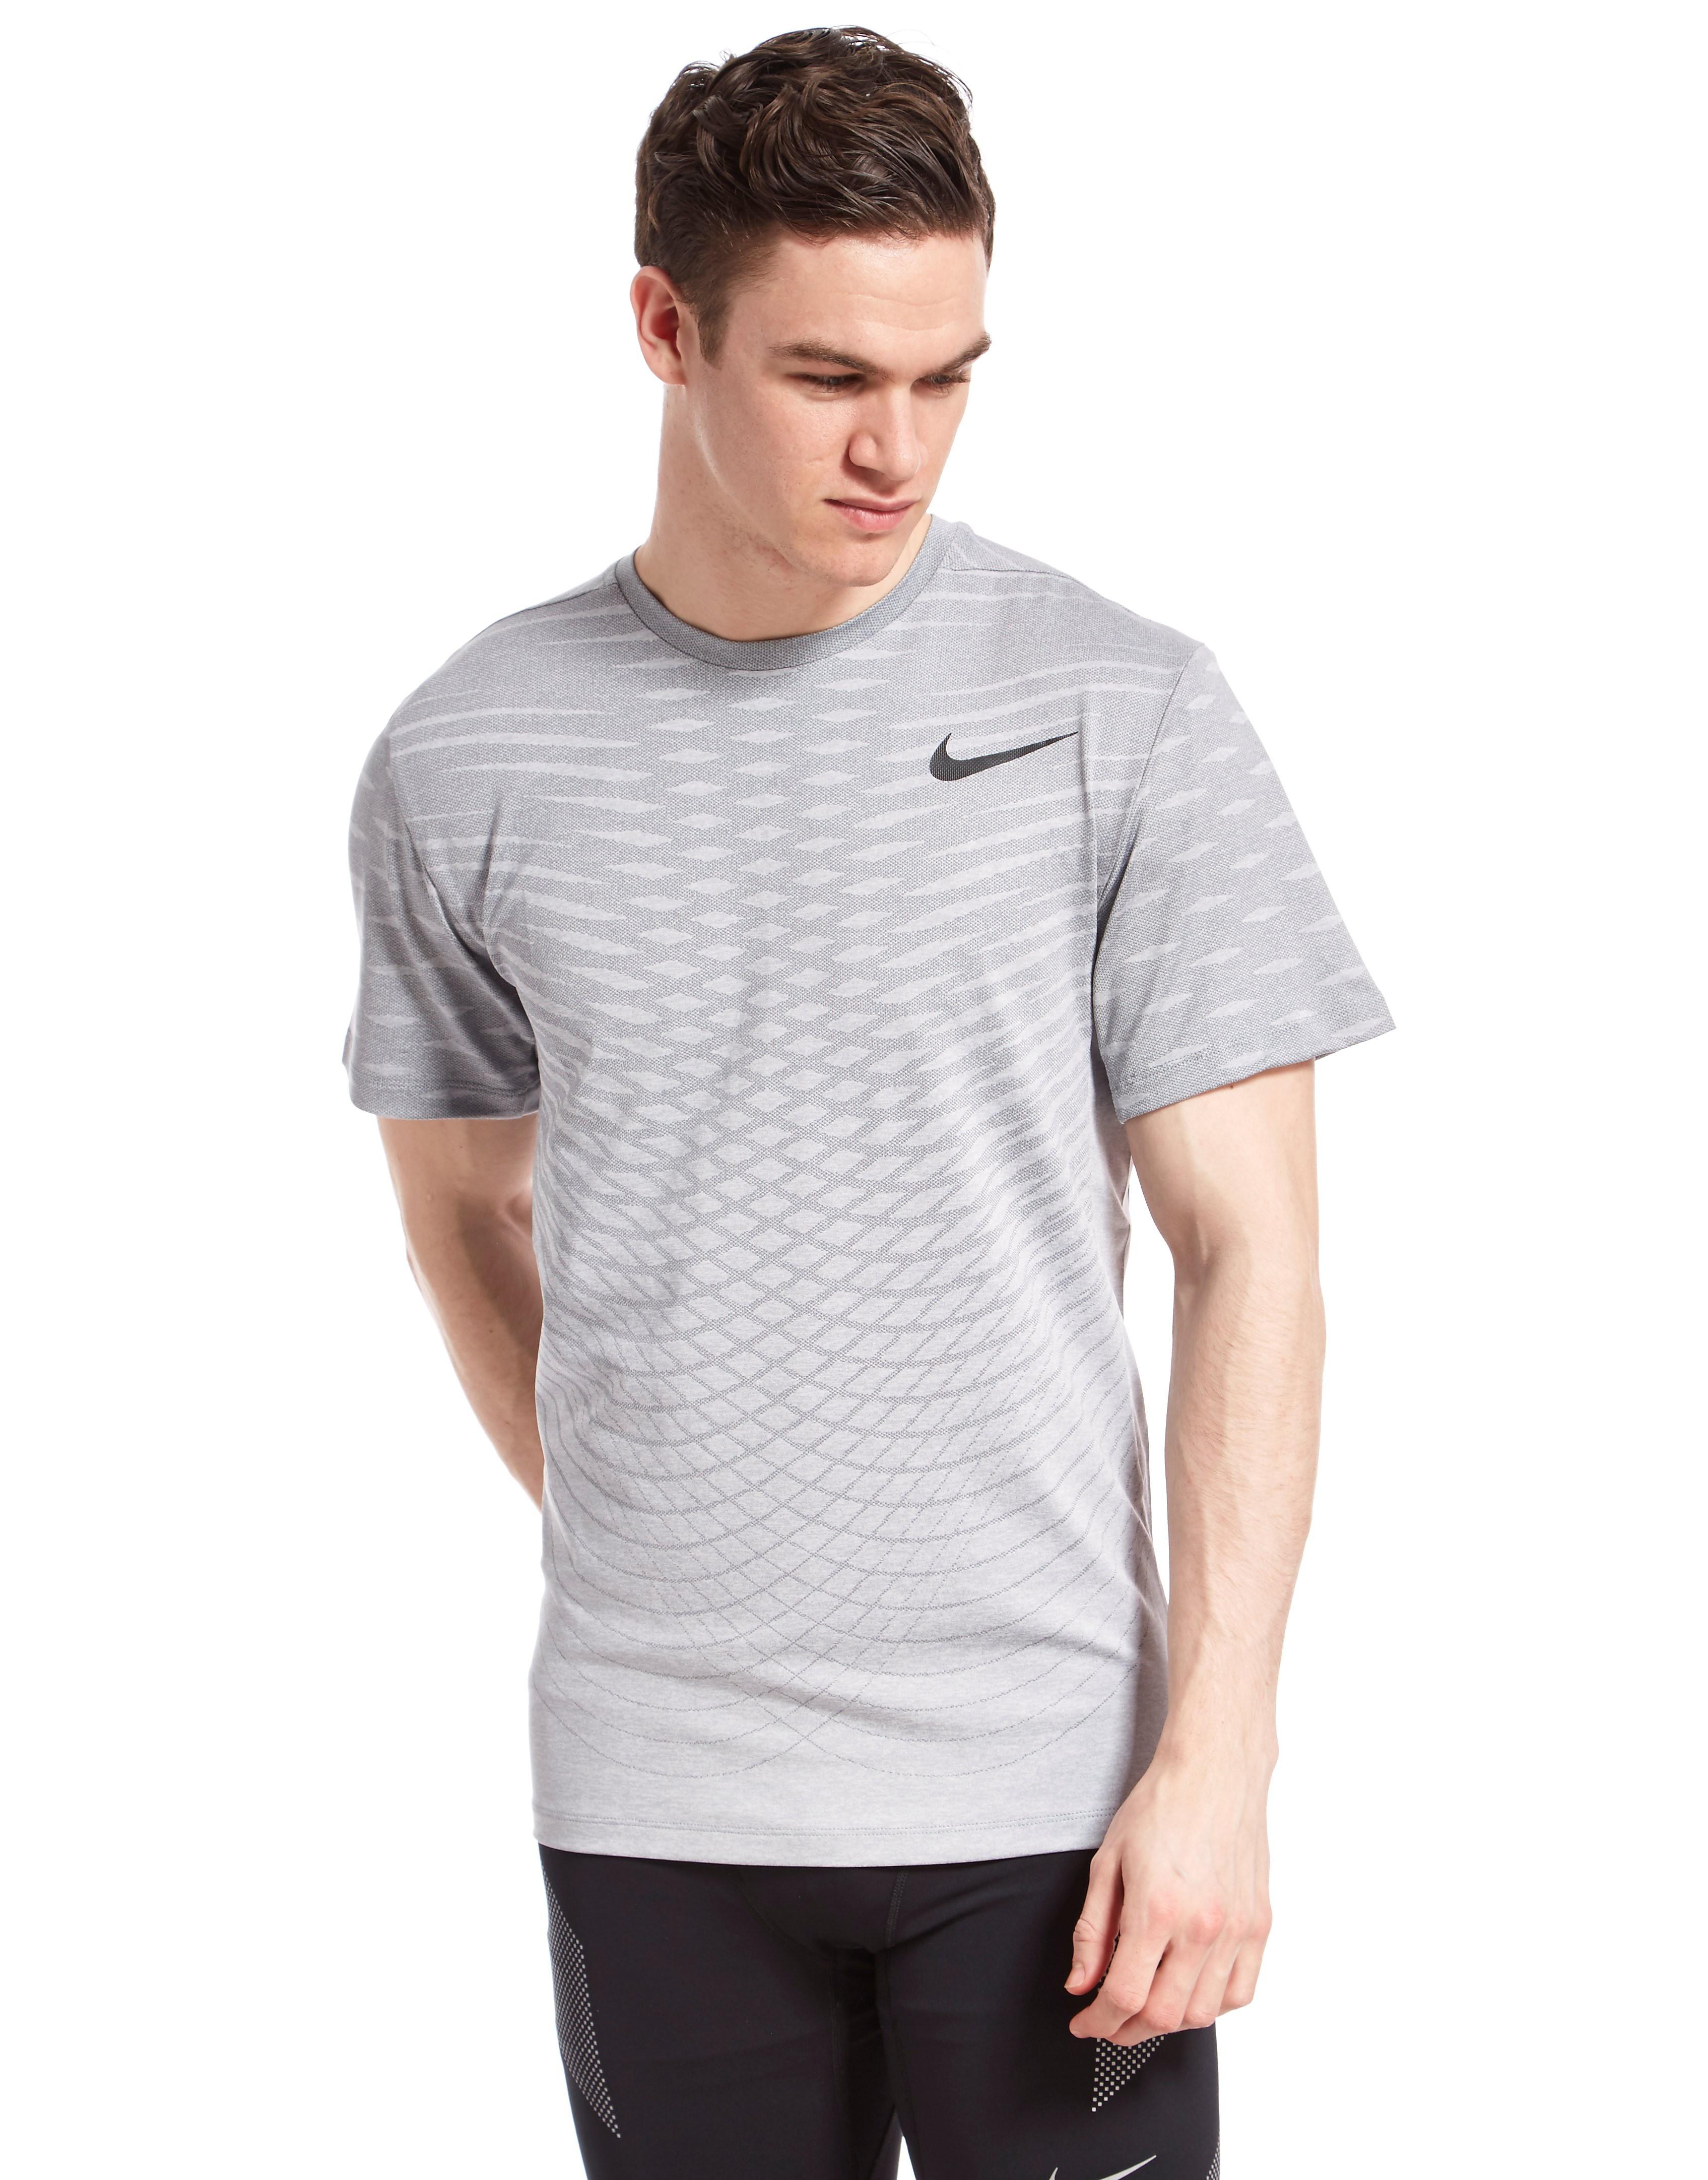 Nike Ultimate Dry Training T-Shirt